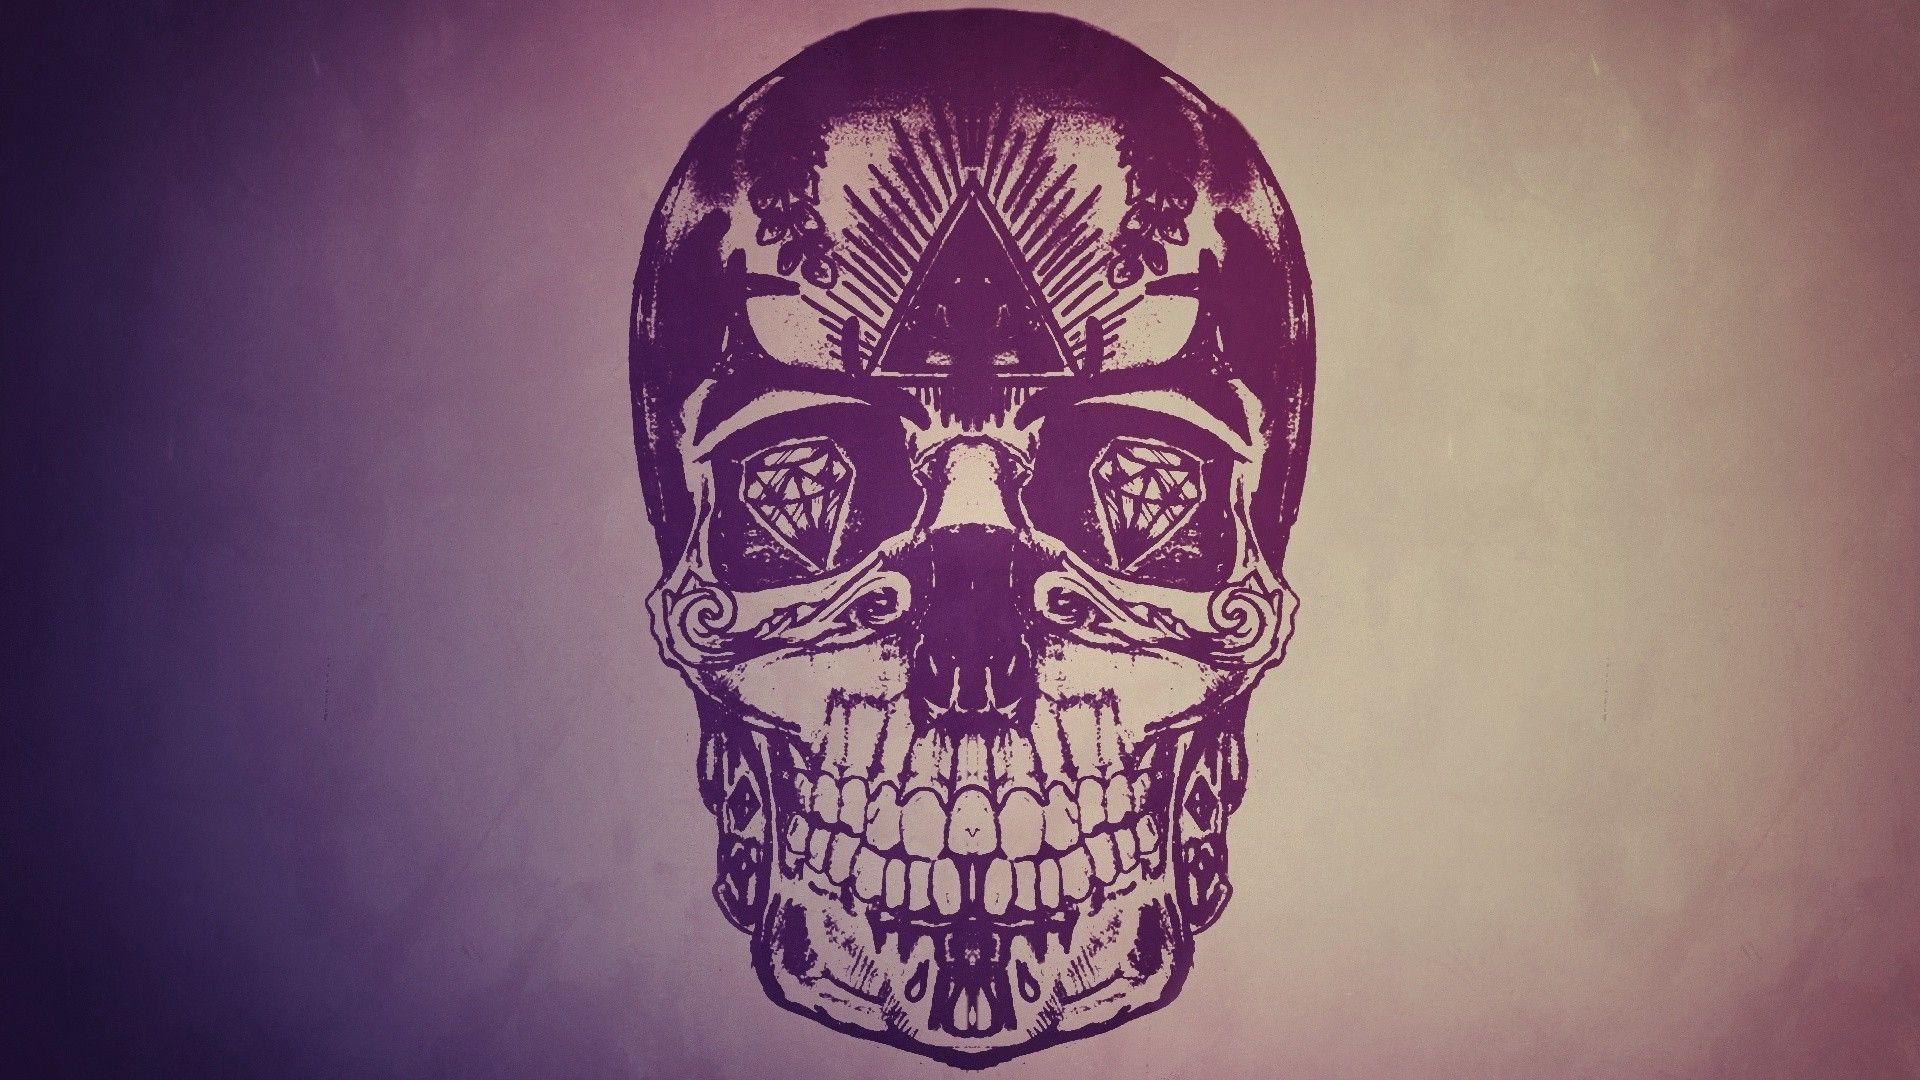 punk skull hd screenshot - photo #47